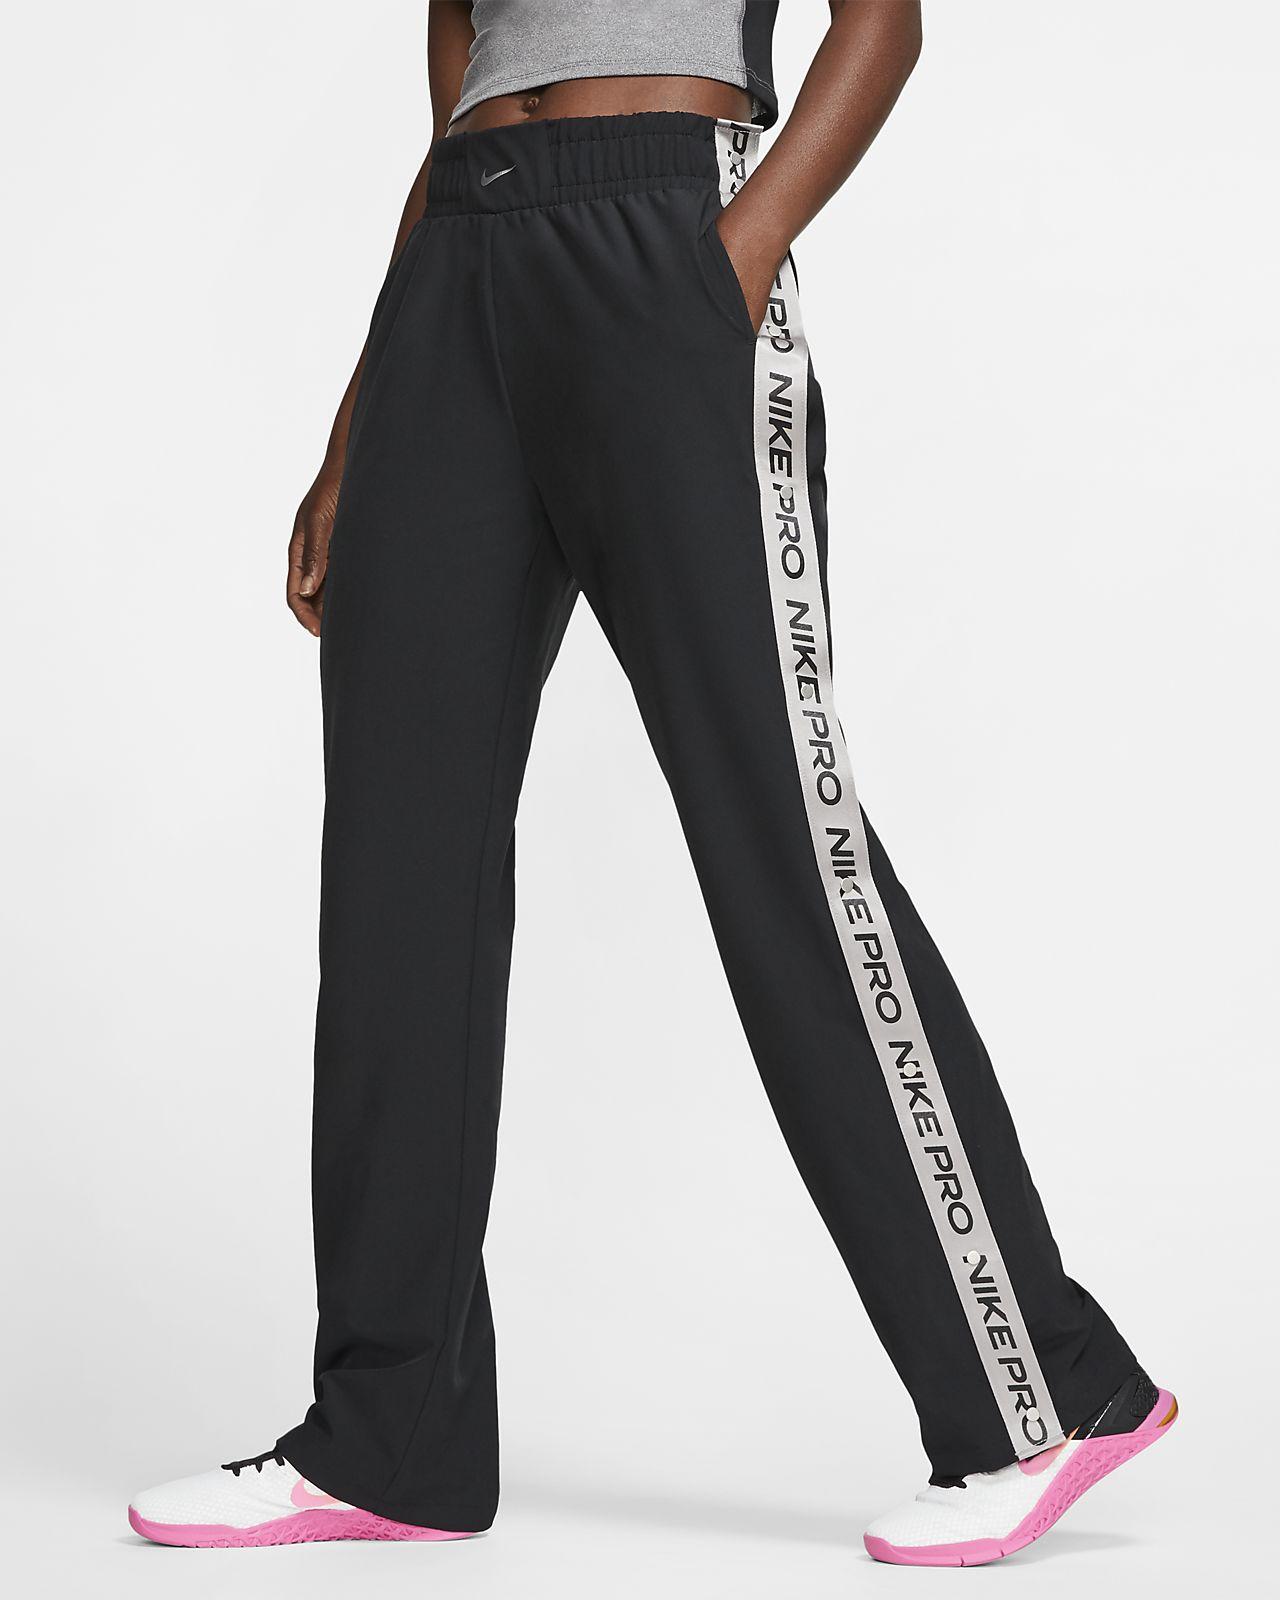 Pantalones con abertura rápida para mujer Nike Pro